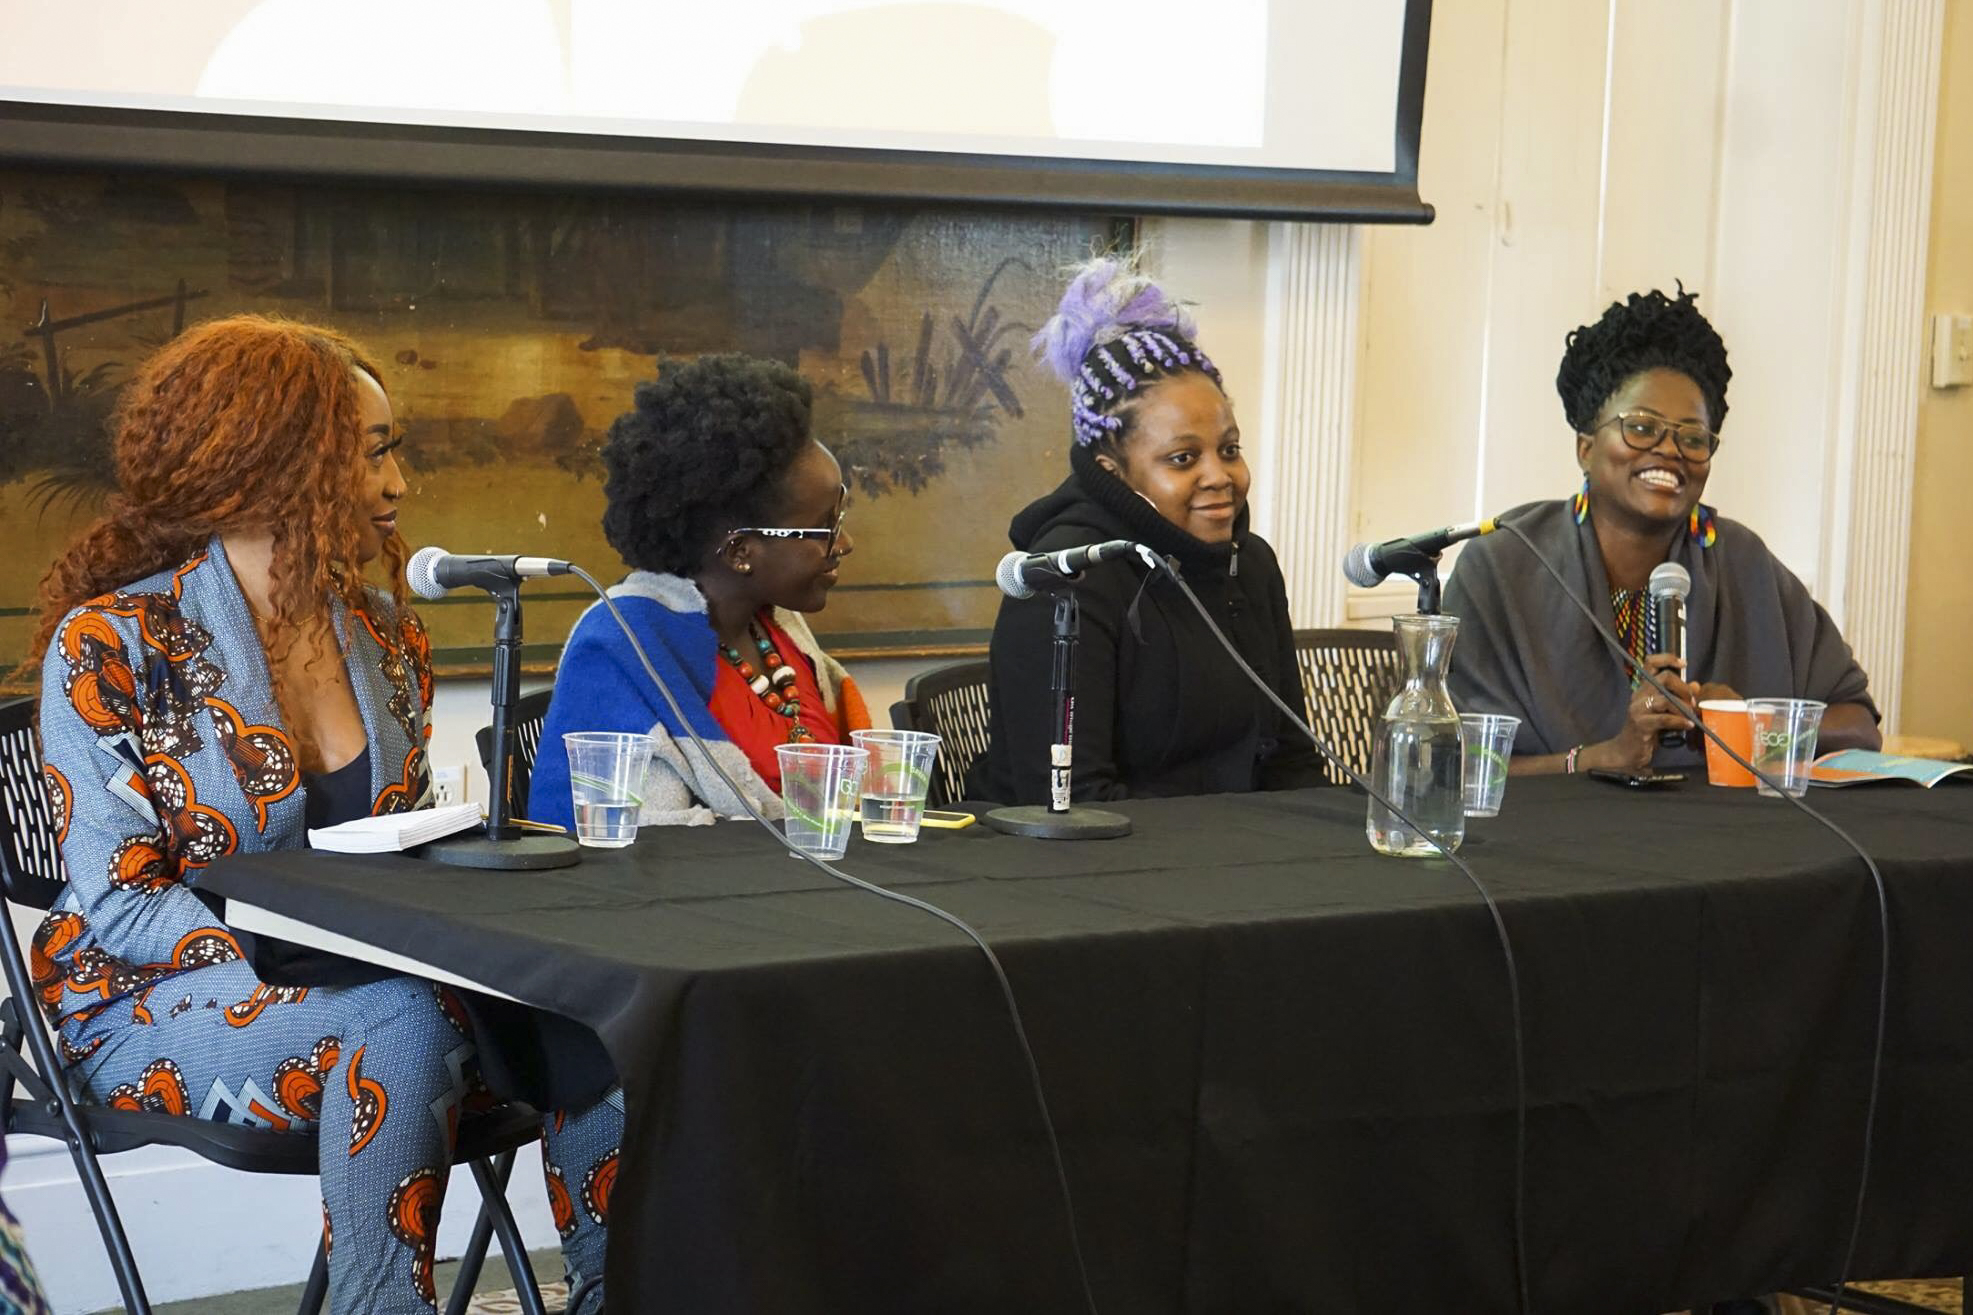 c/o African Student Association